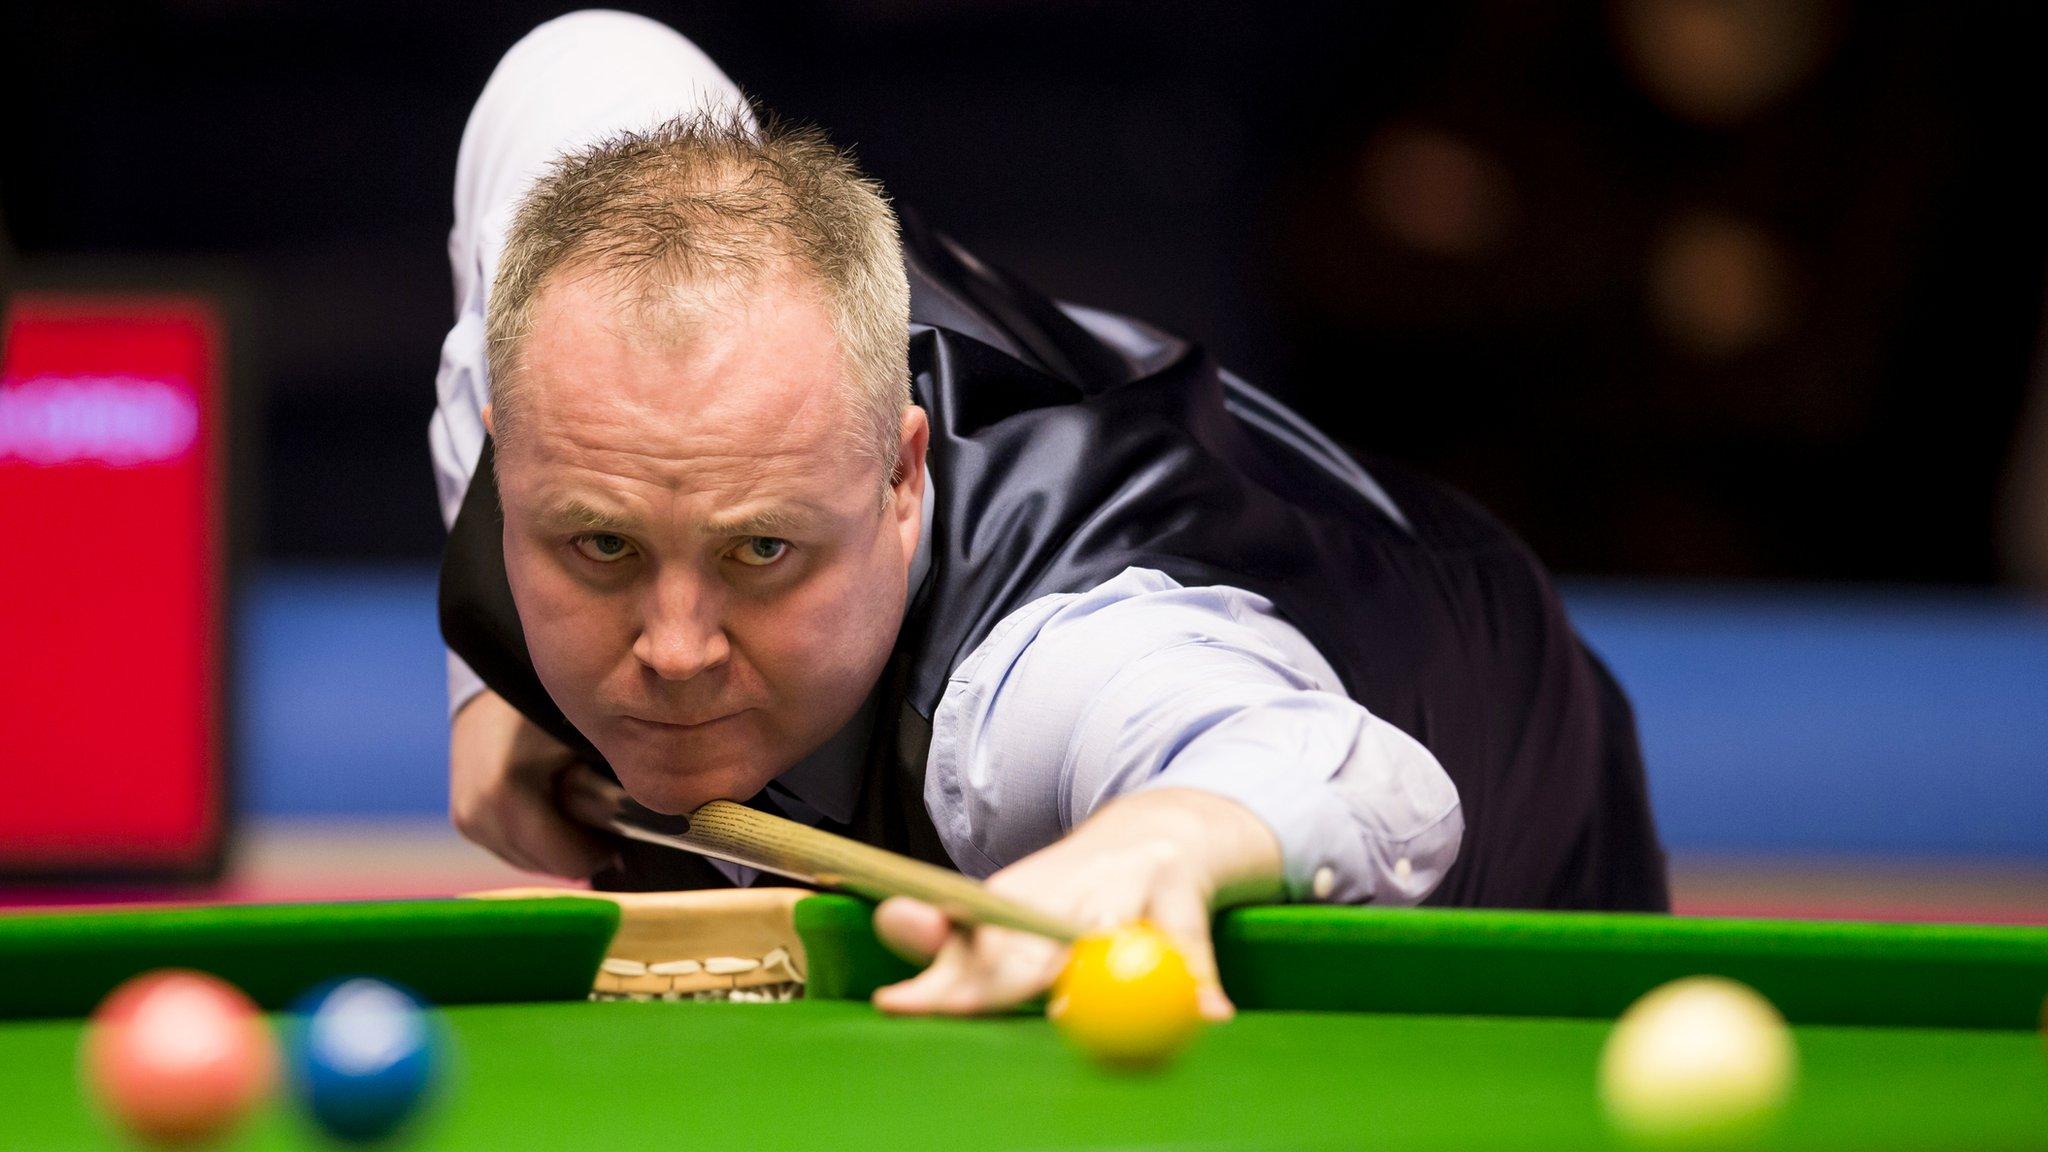 Scottish Open: John Higgins to face Ronnie O'Sullivan in quarter-finals